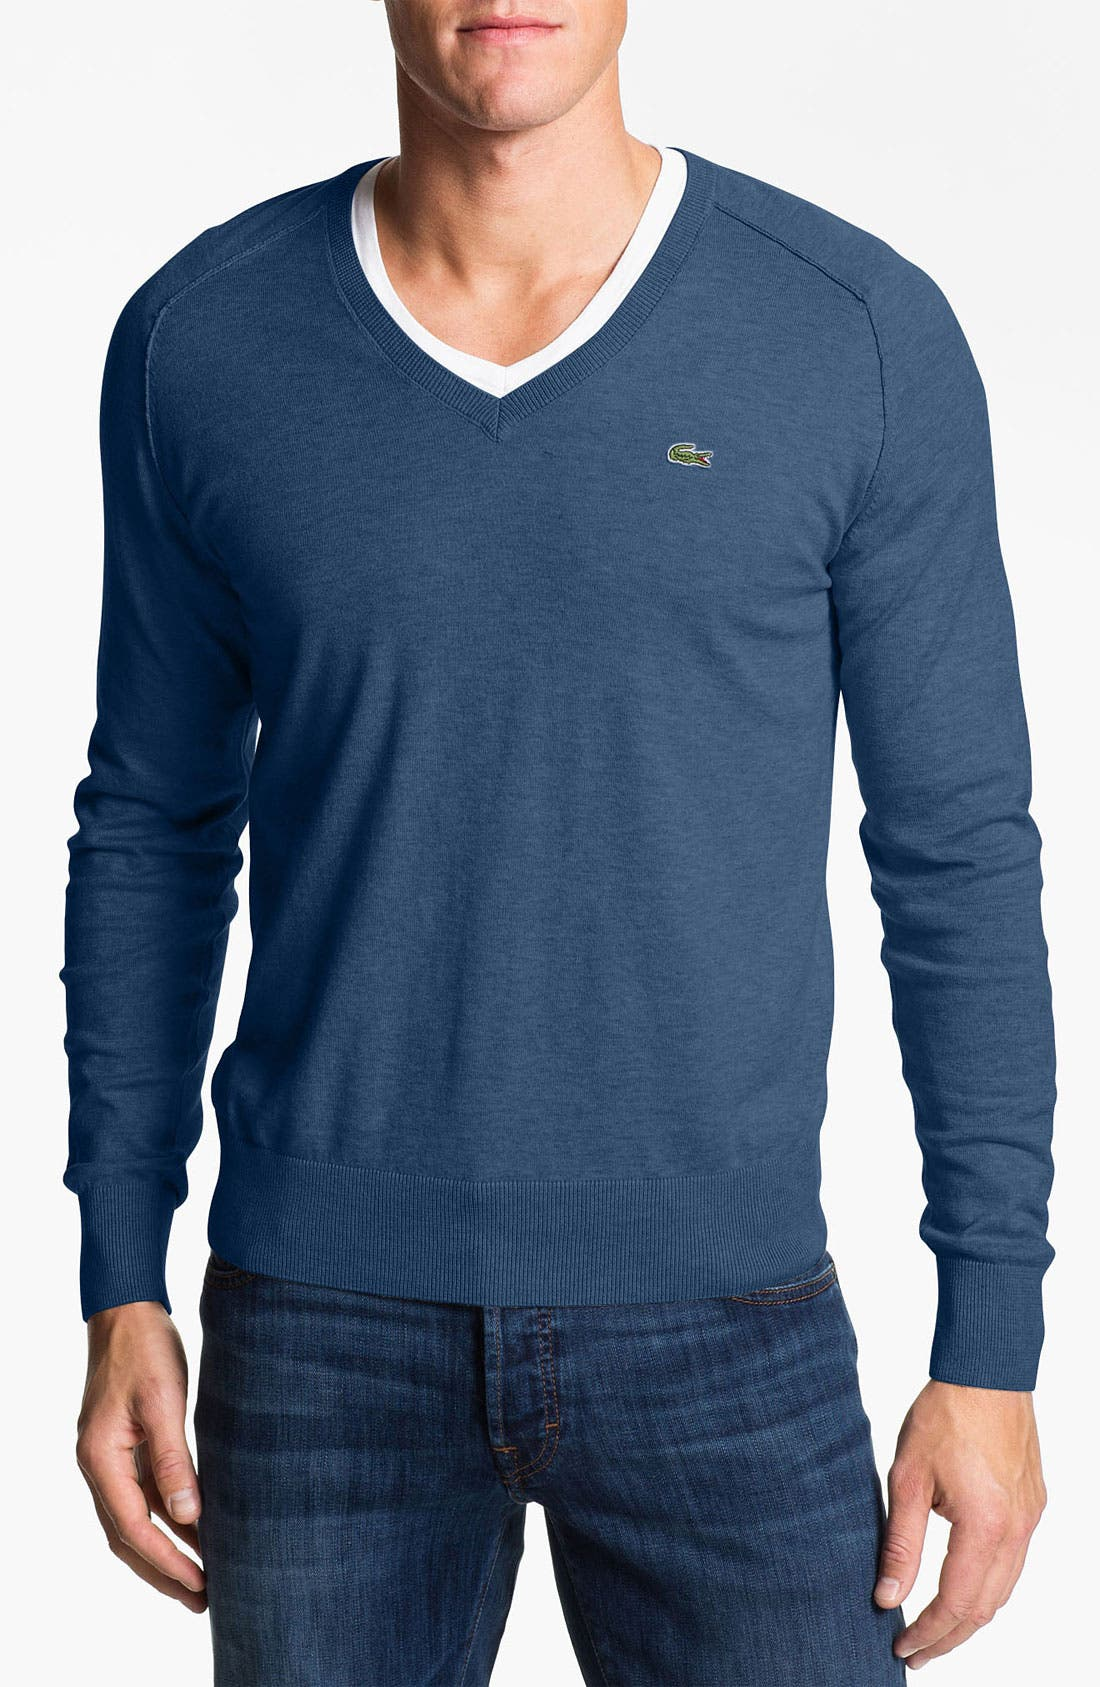 Main Image - Lacoste V-Neck Sweater